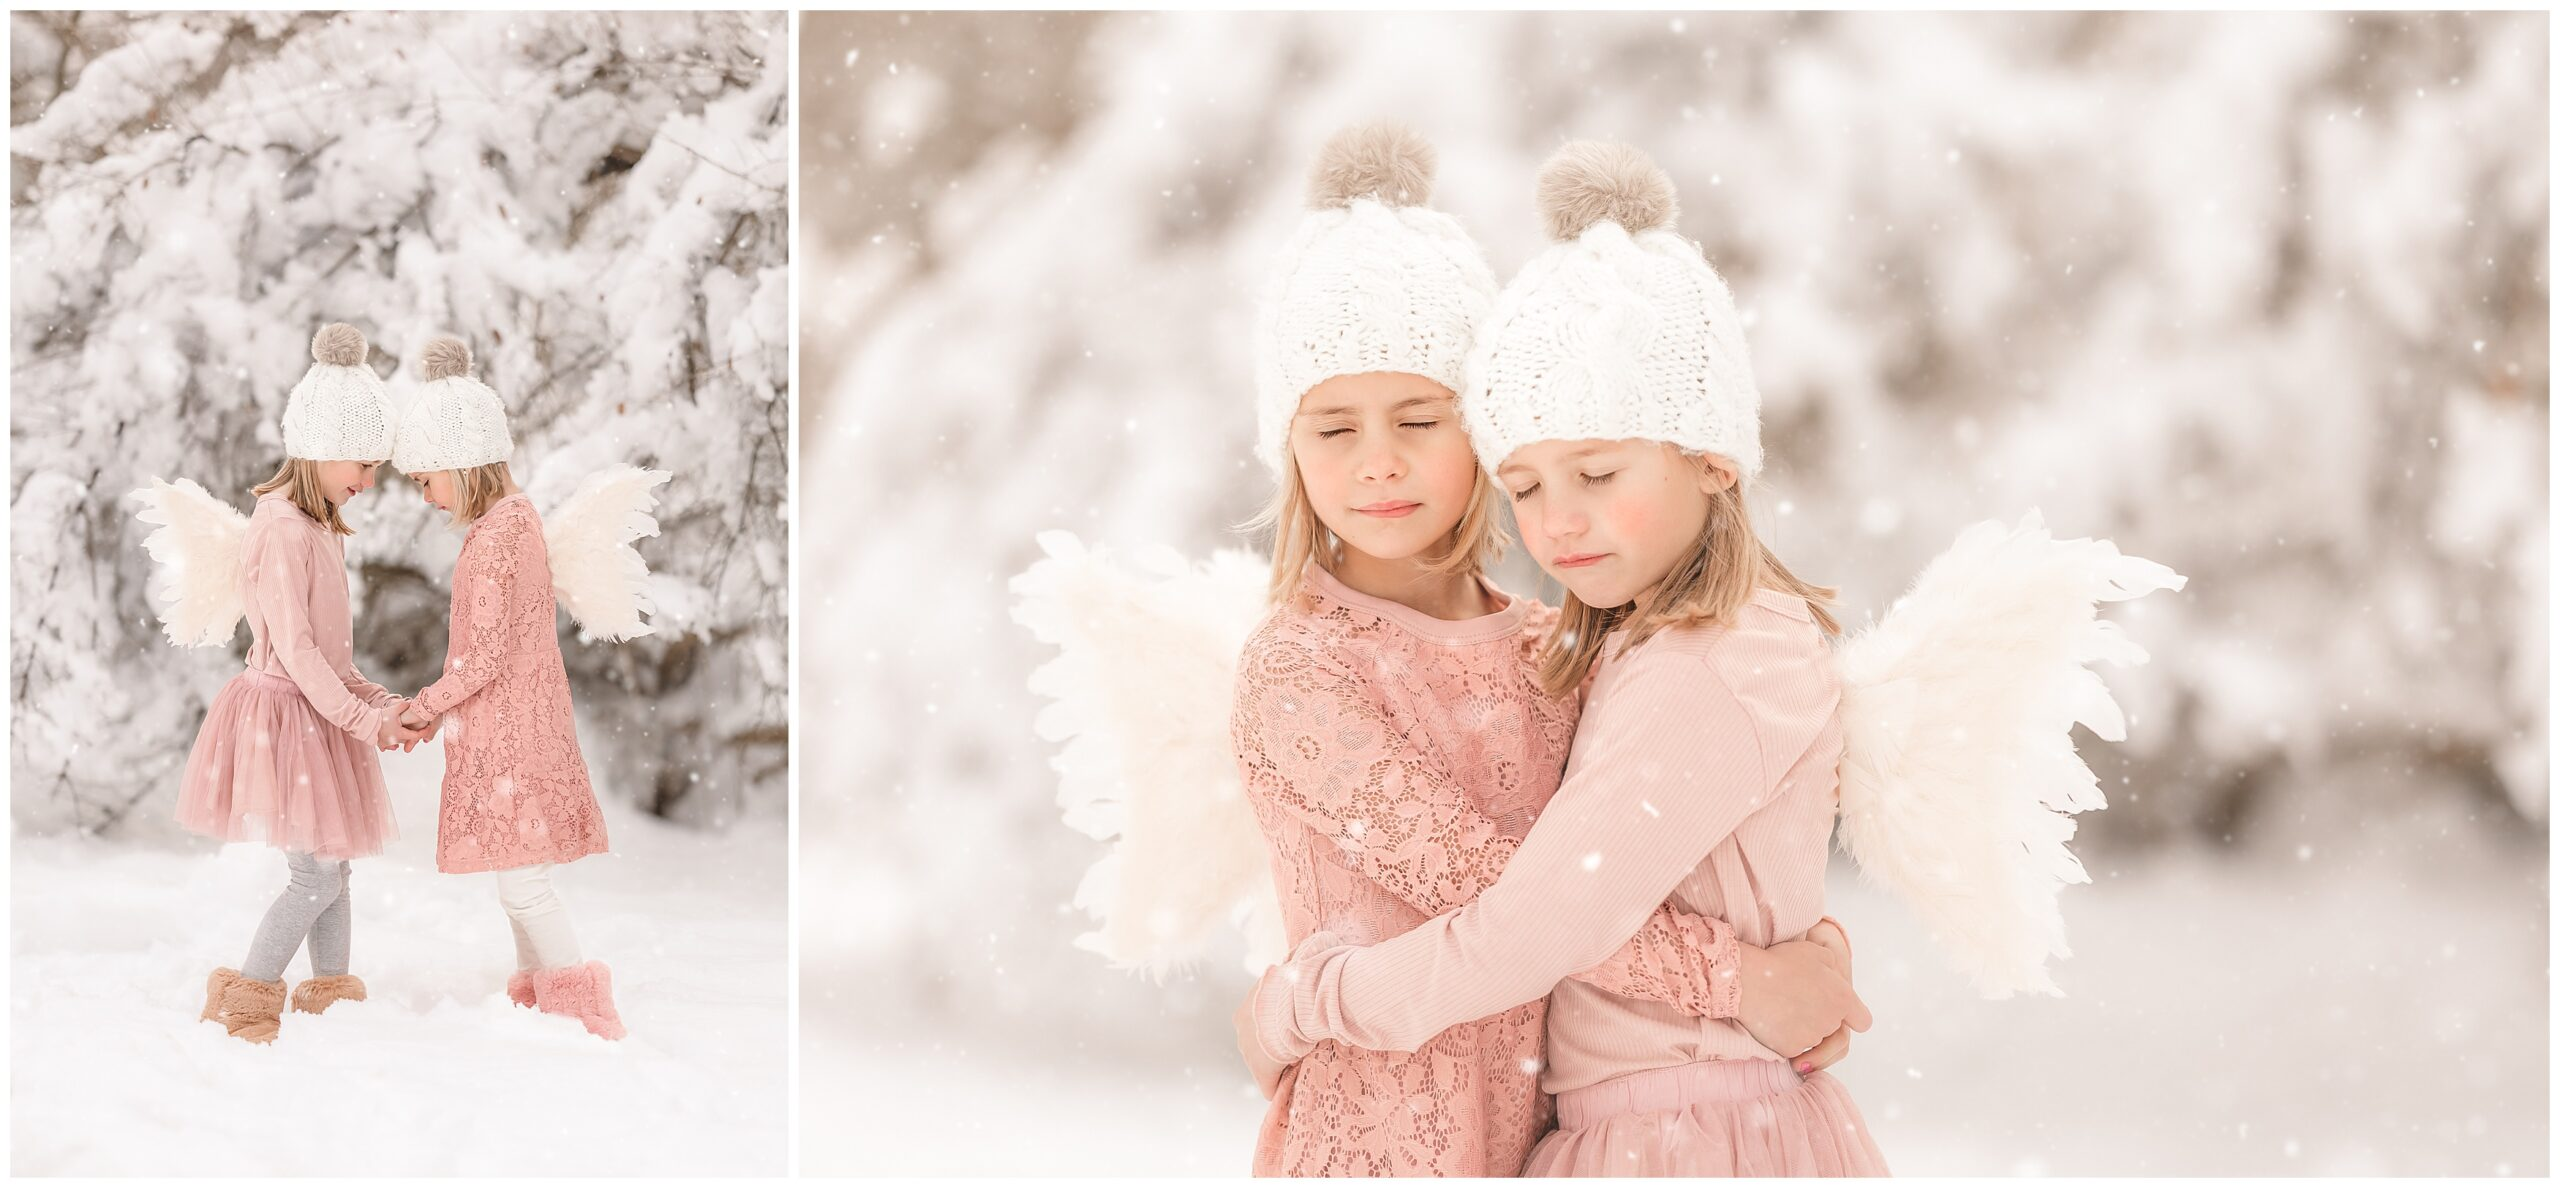 Pamela Salai Photography snow mini session 2